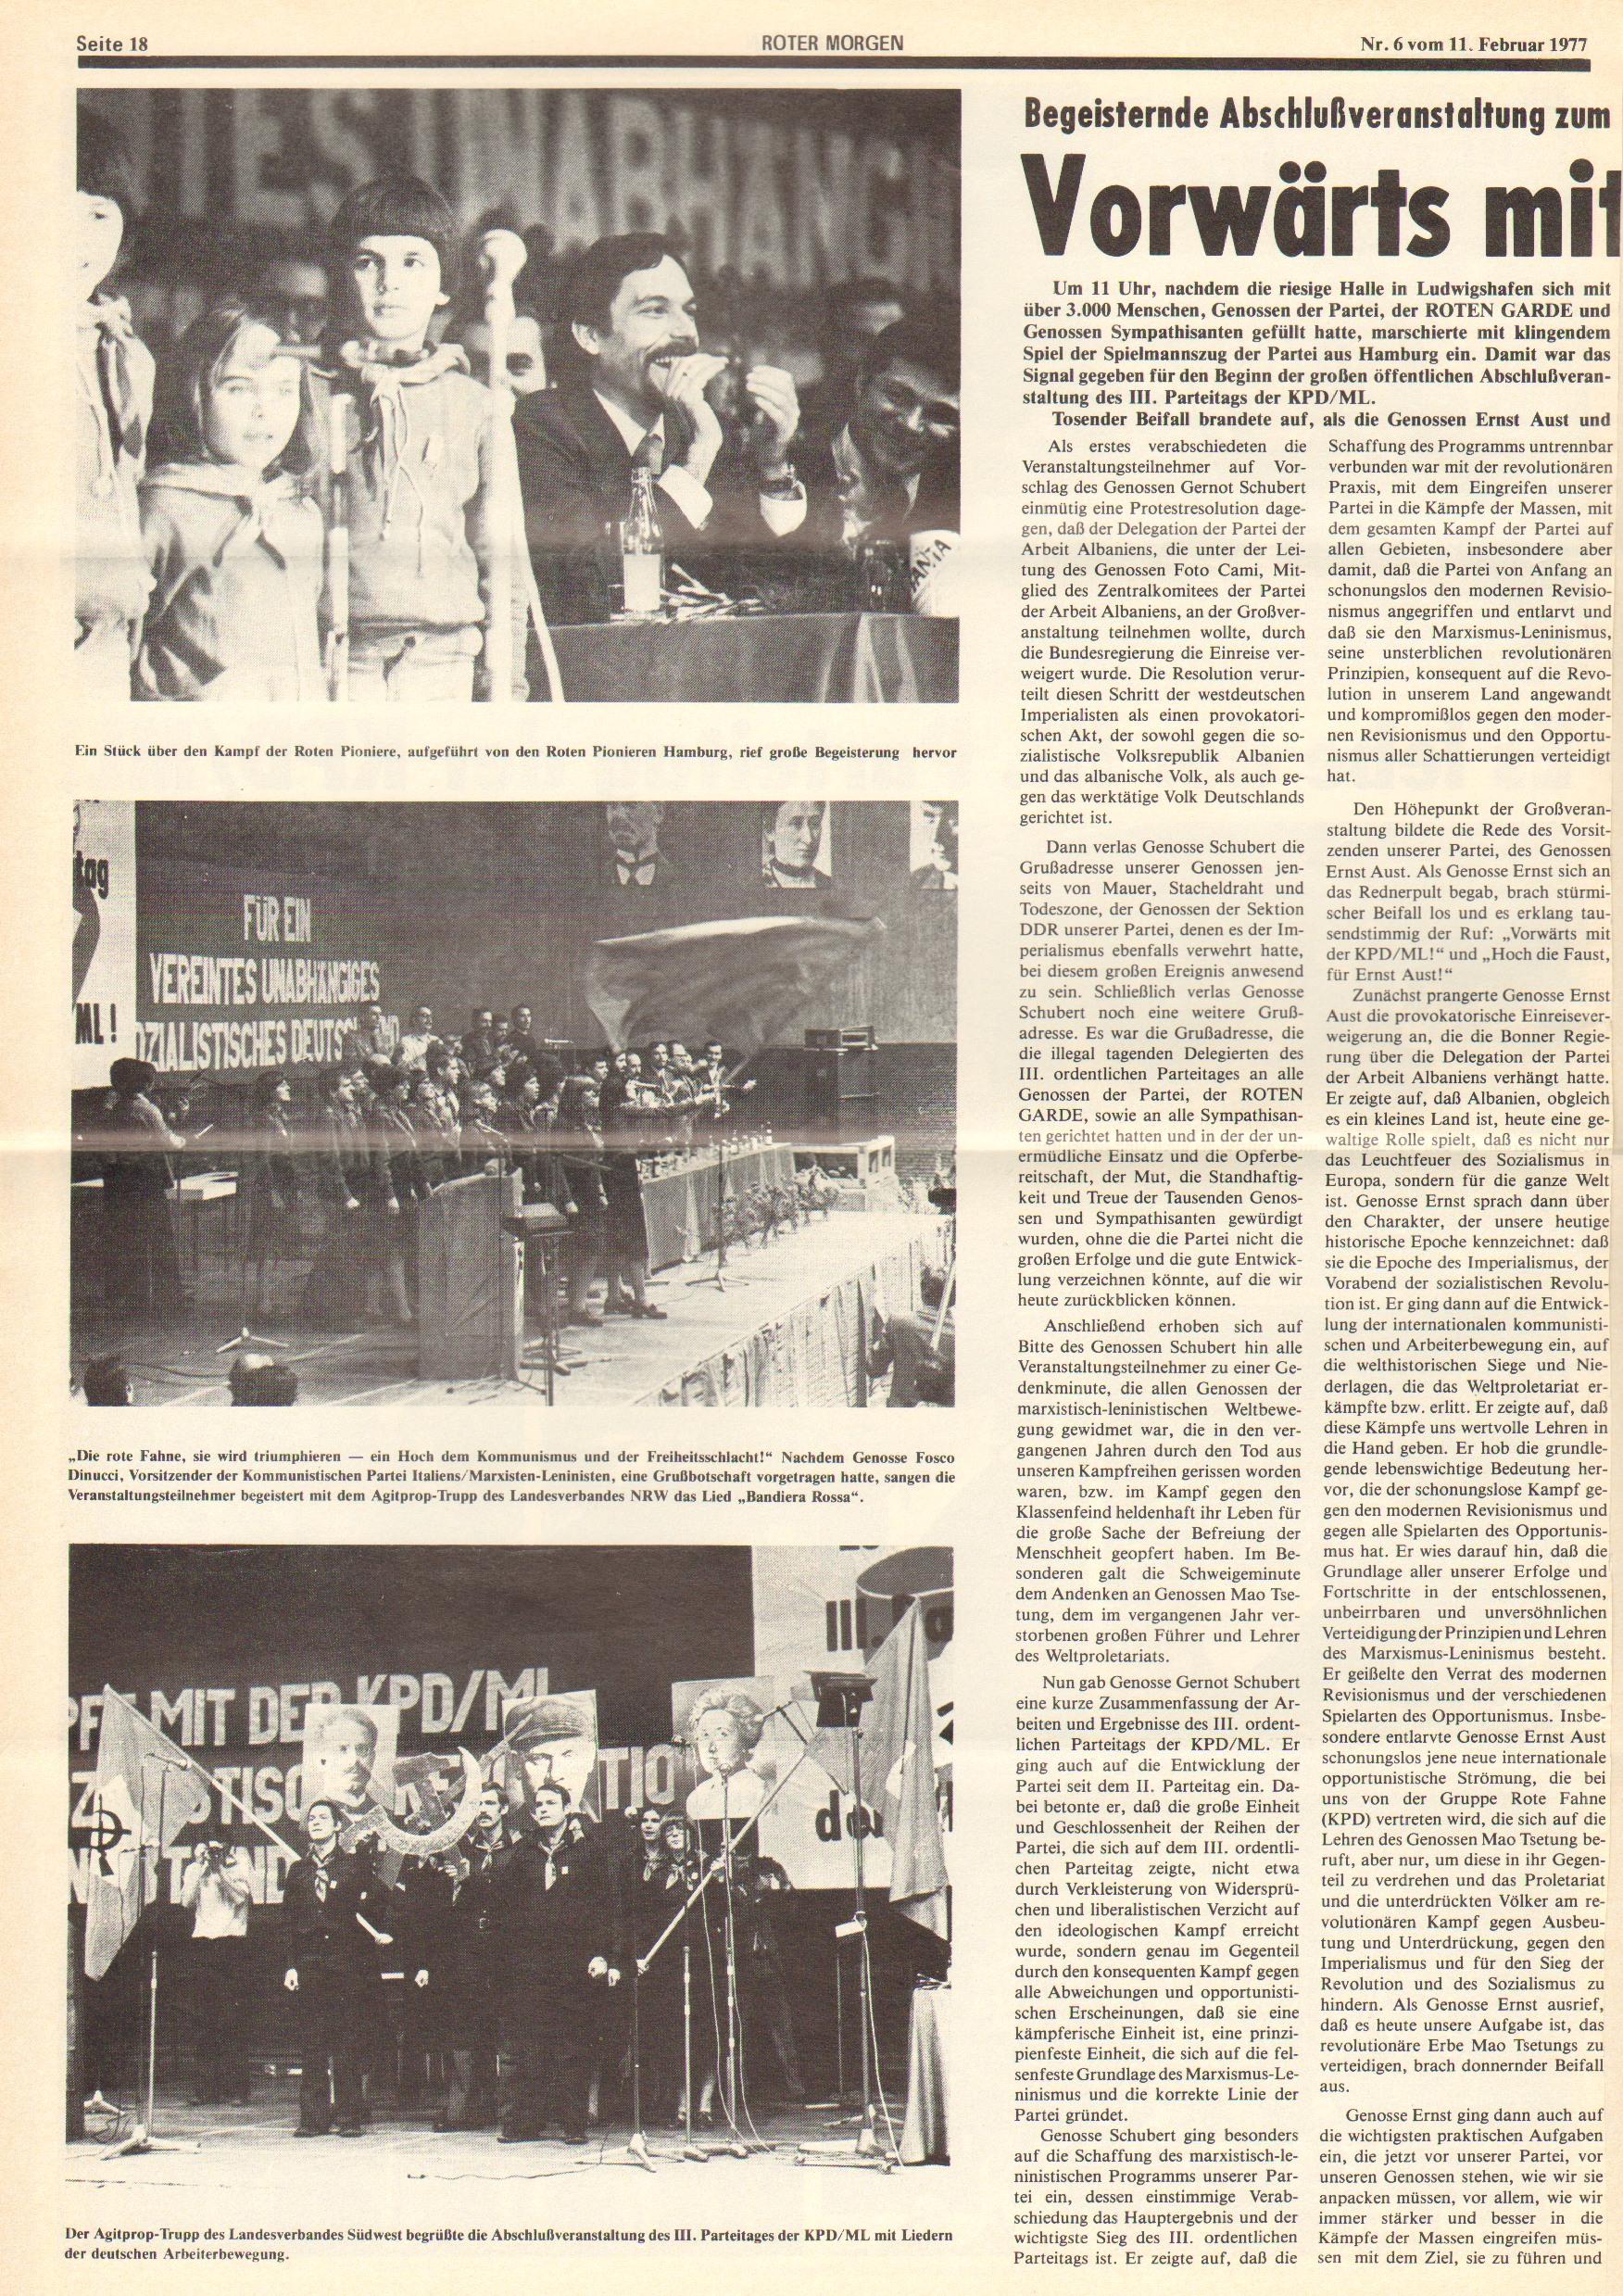 Roter Morgen, 11. Jg., 11. Februar 1977, Nr. 6, Seite 18